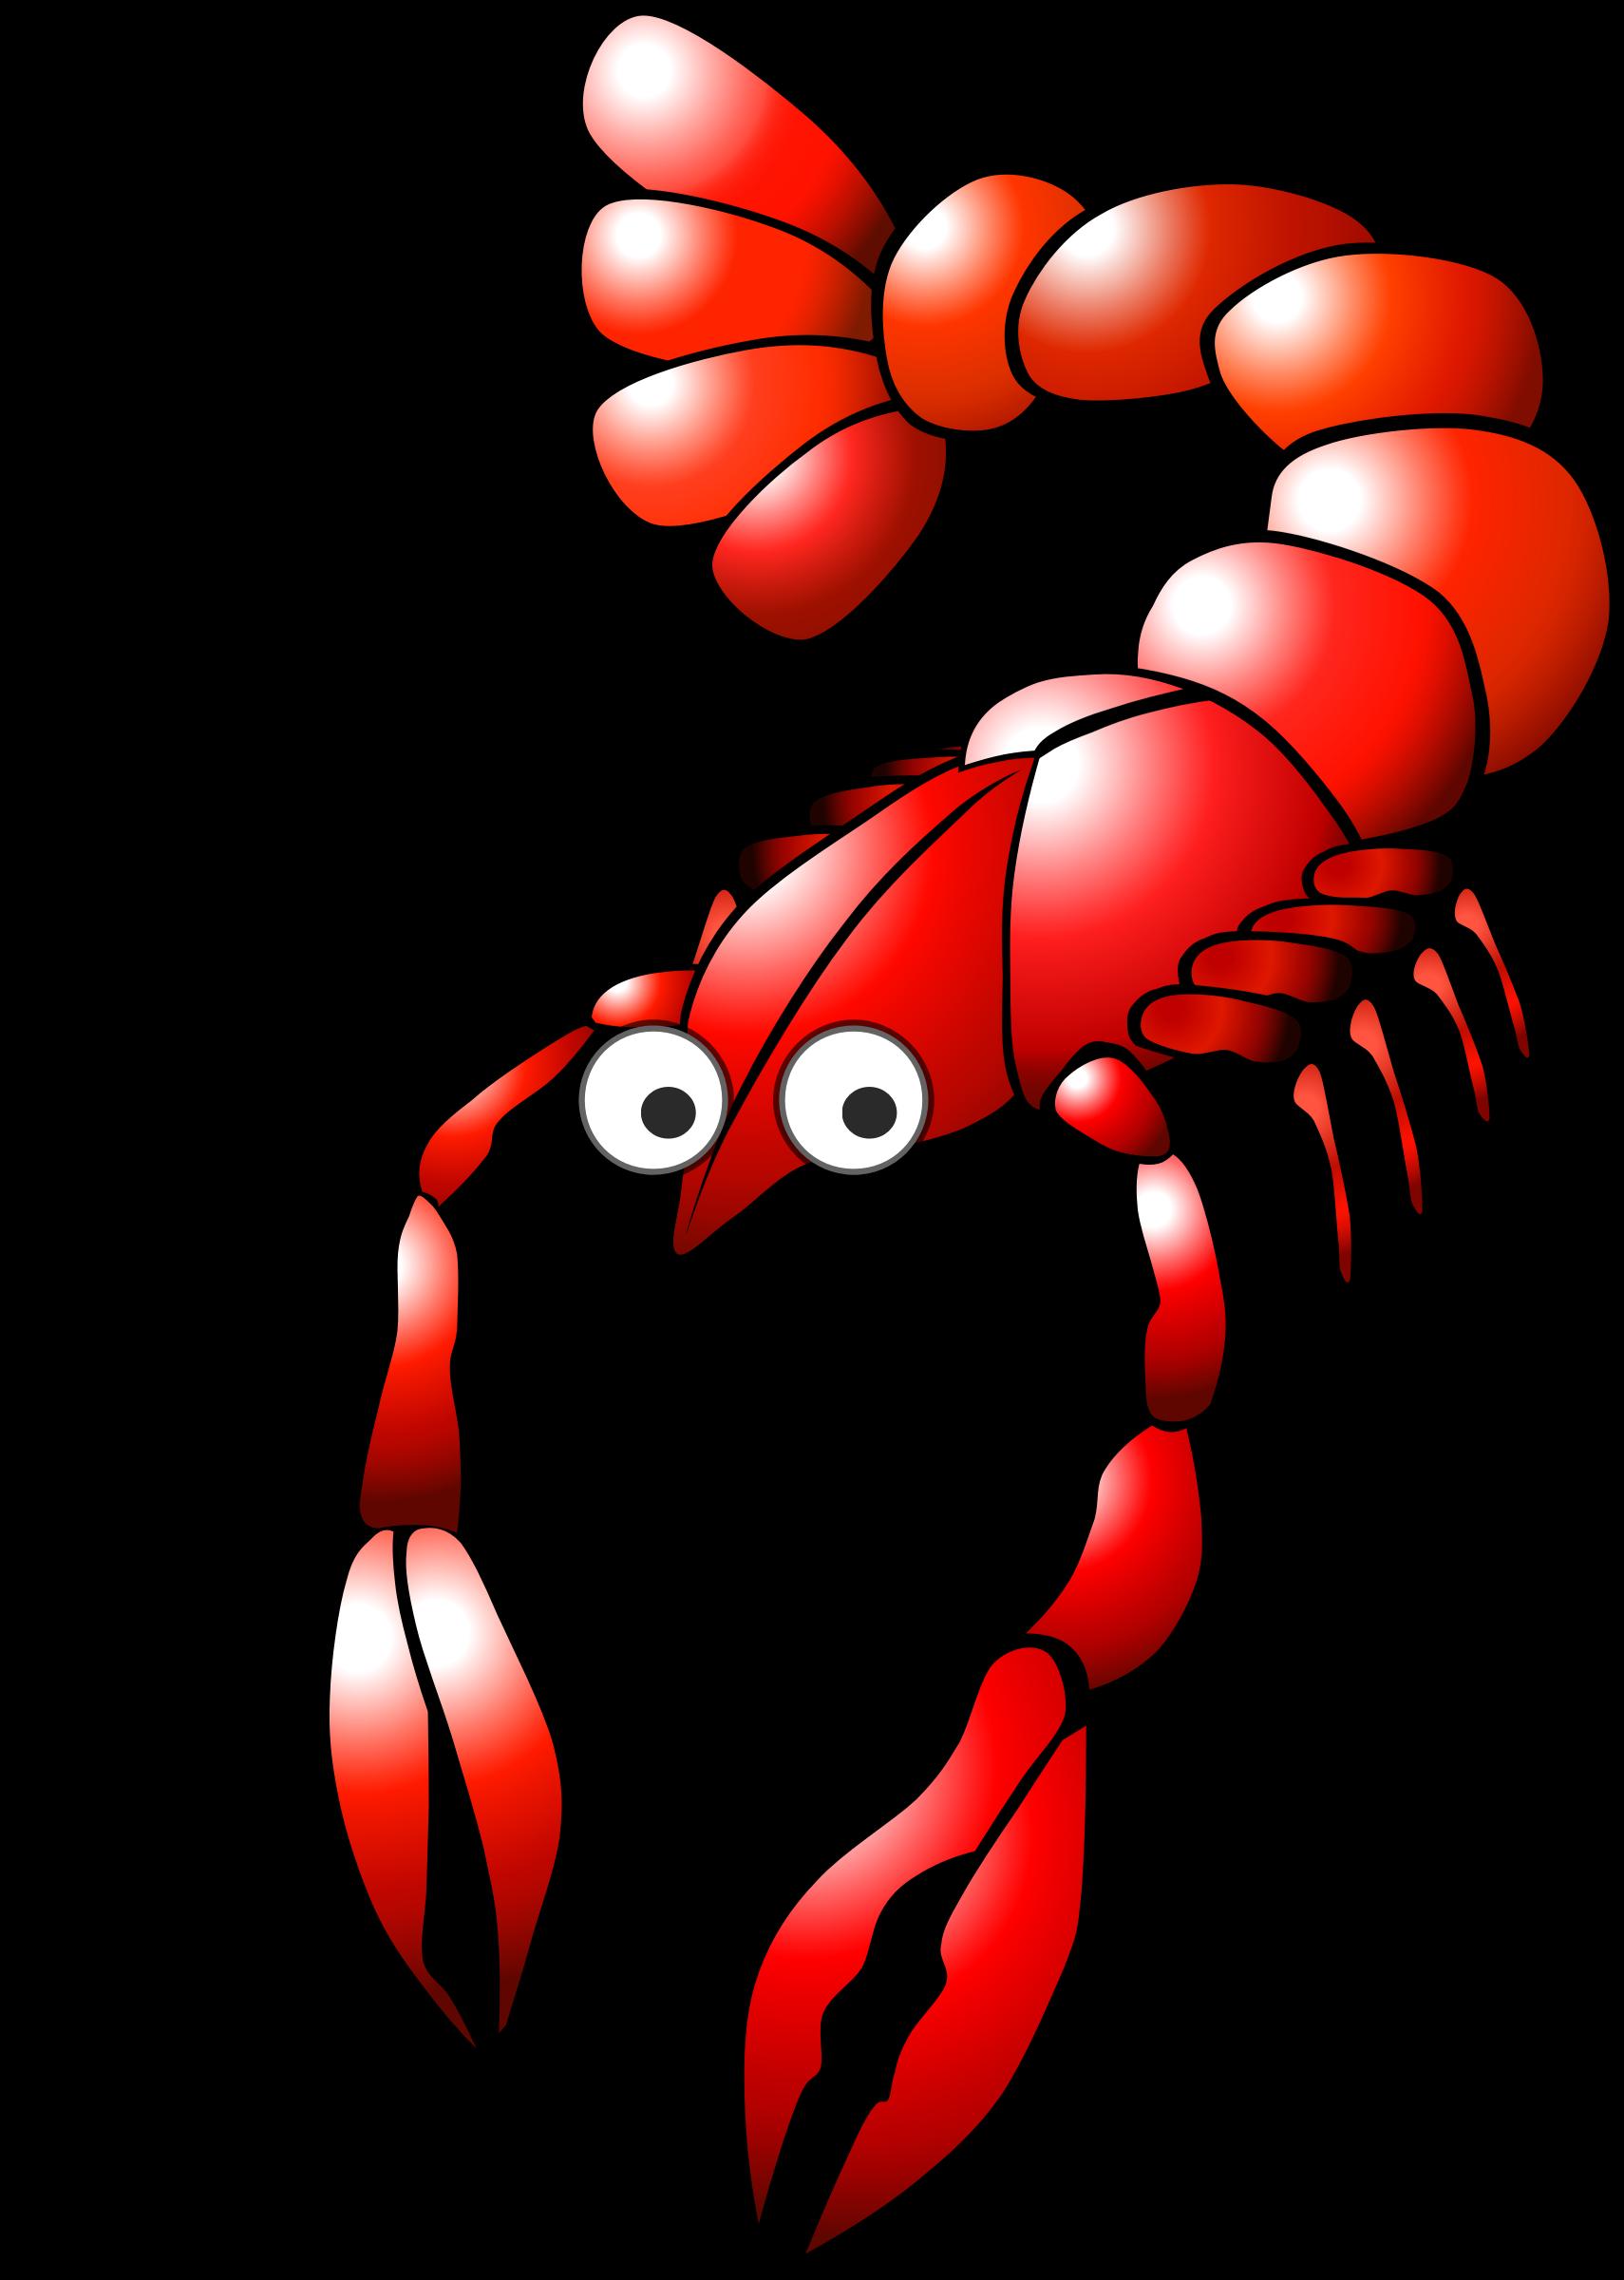 Cartoon crayfish icons png. Crabs clipart toon